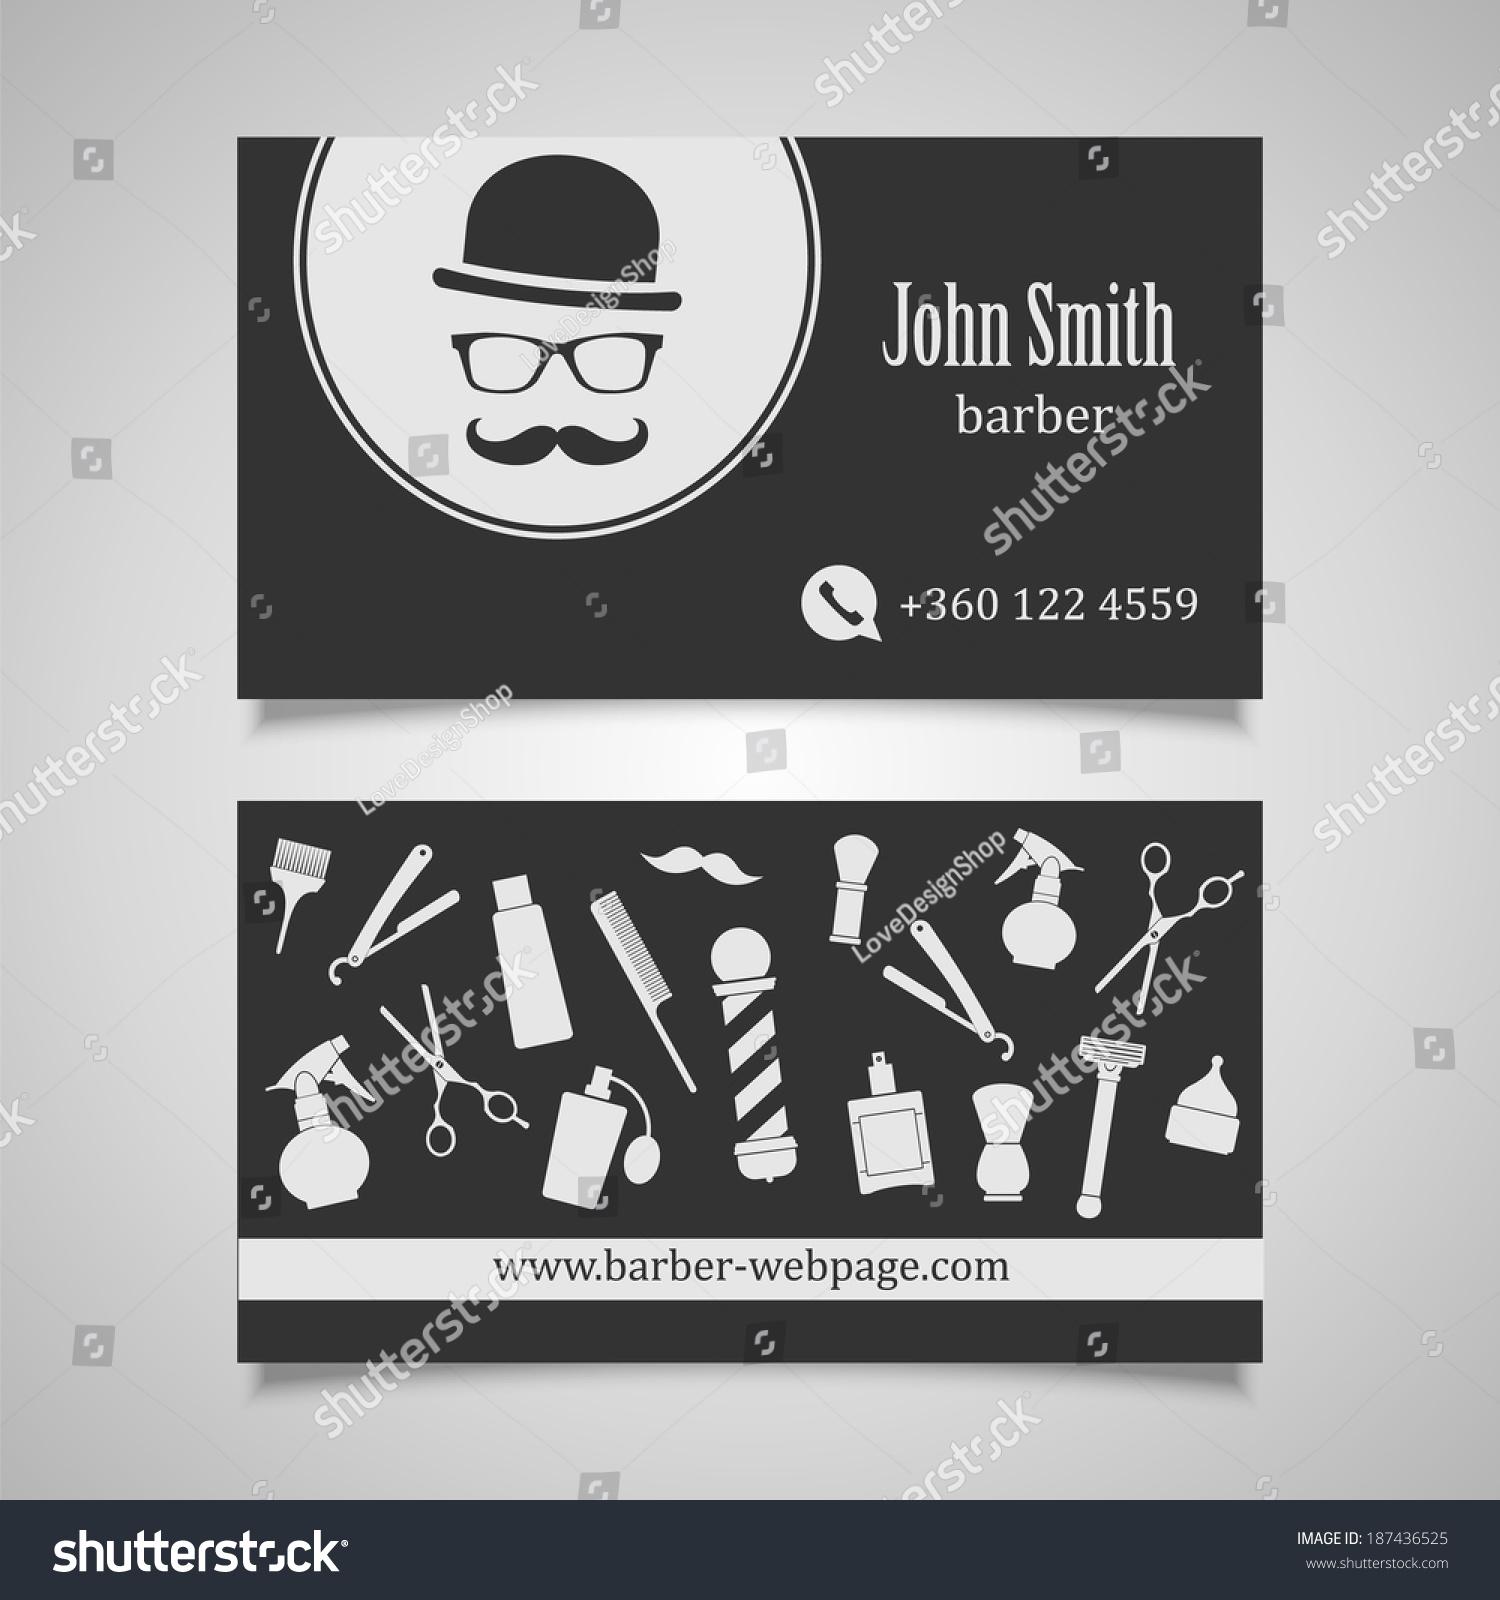 Hair Salon Barber Business Card Design Stock Photo (Photo, Vector ...